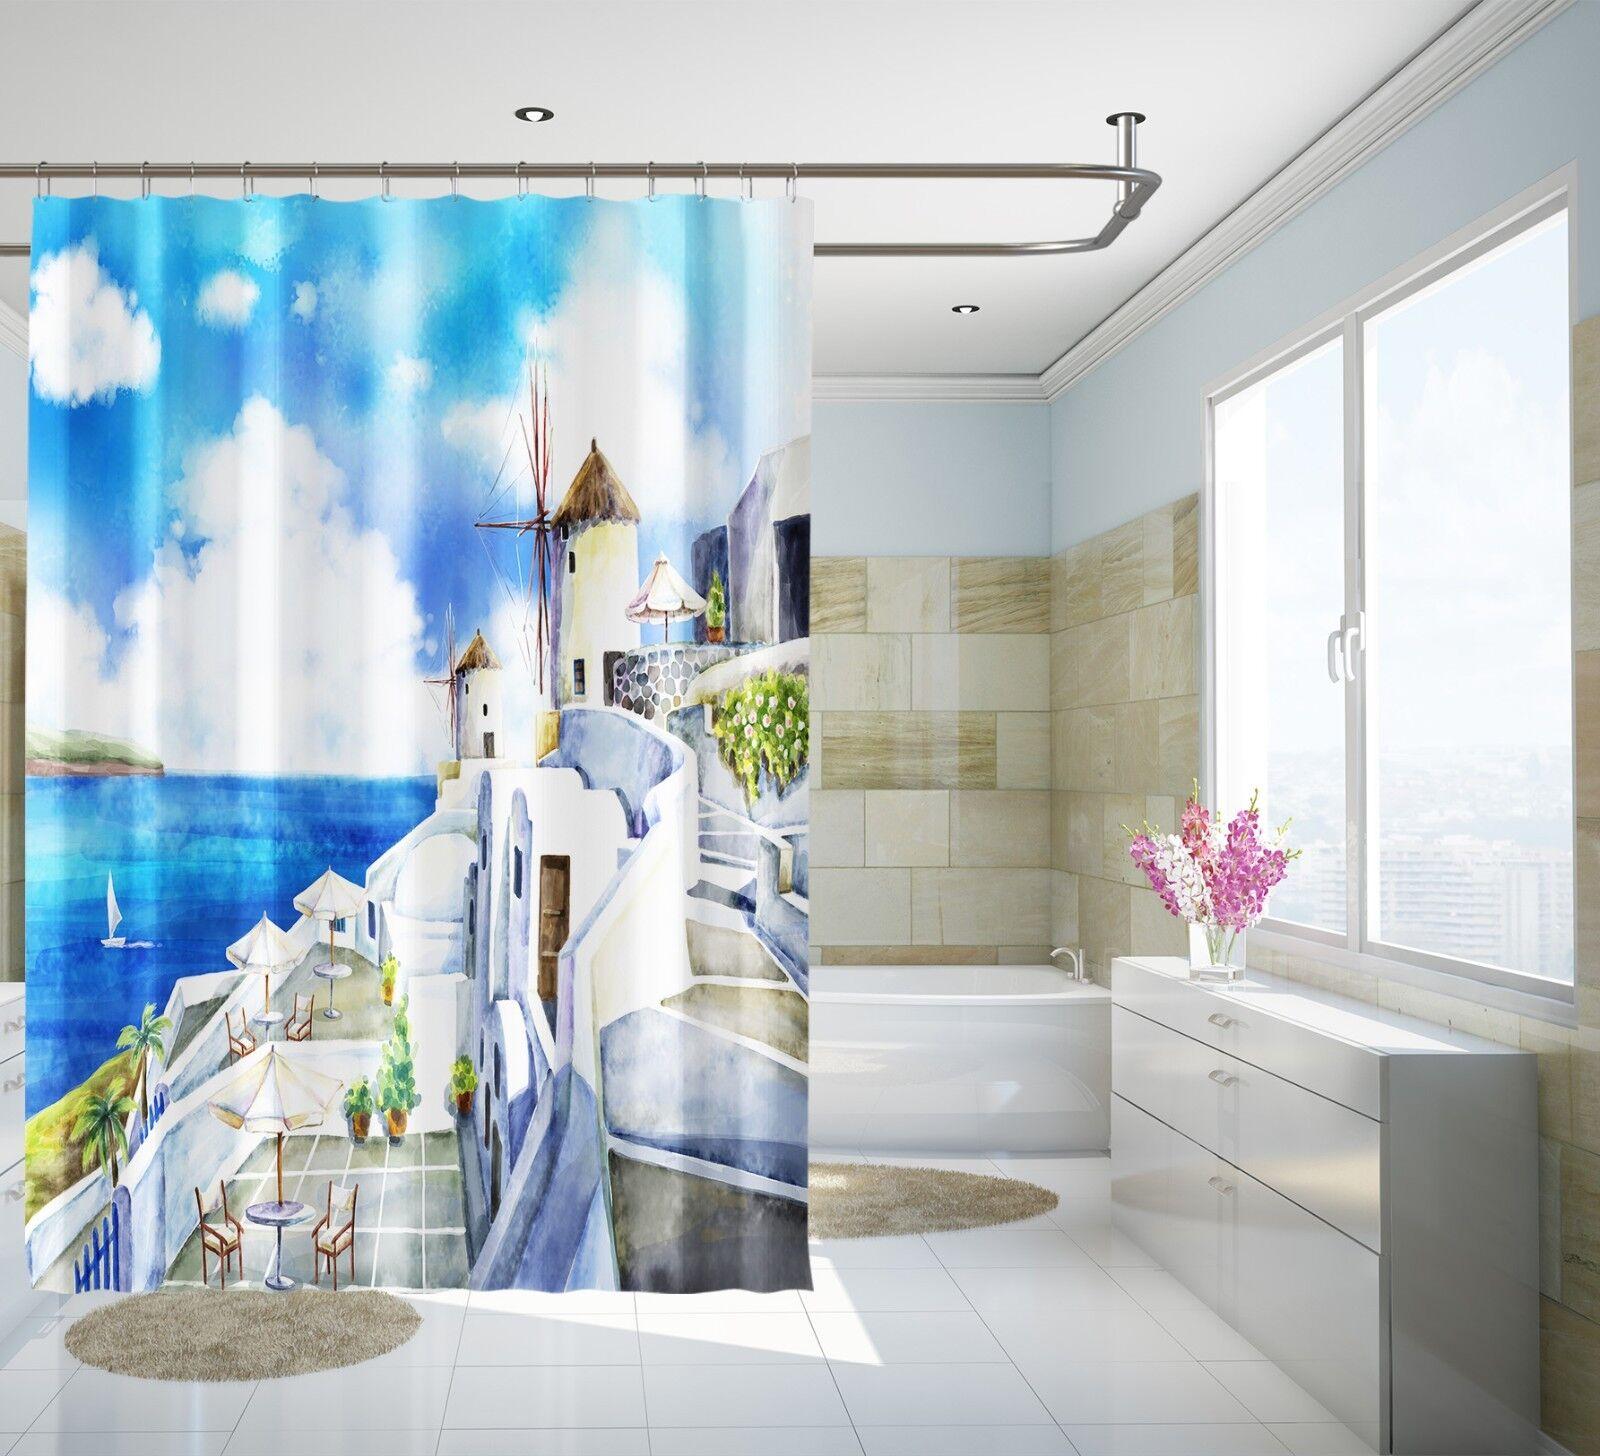 3D Liebe Meer 323 Duschvorhang Wasserdicht Faser Bad Daheim Windows Toilette DE | Neueste Technologie